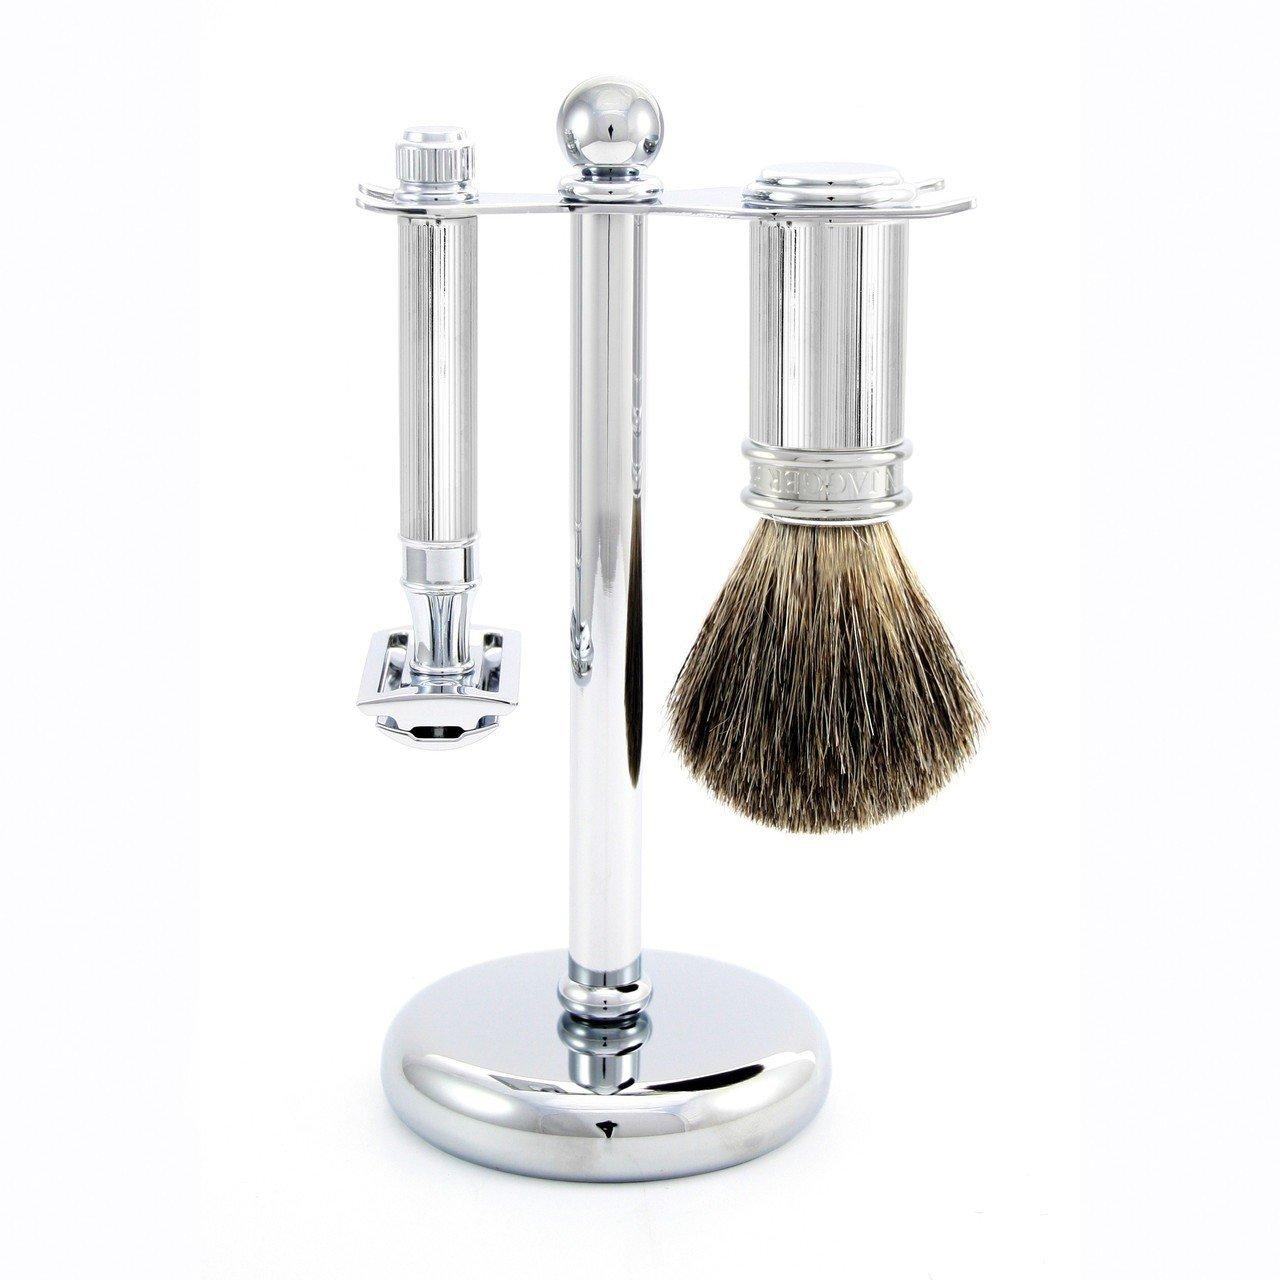 Edwin Jagger 3 Piece DE 89L Shaving Set - Chrome by Edwin Jagger